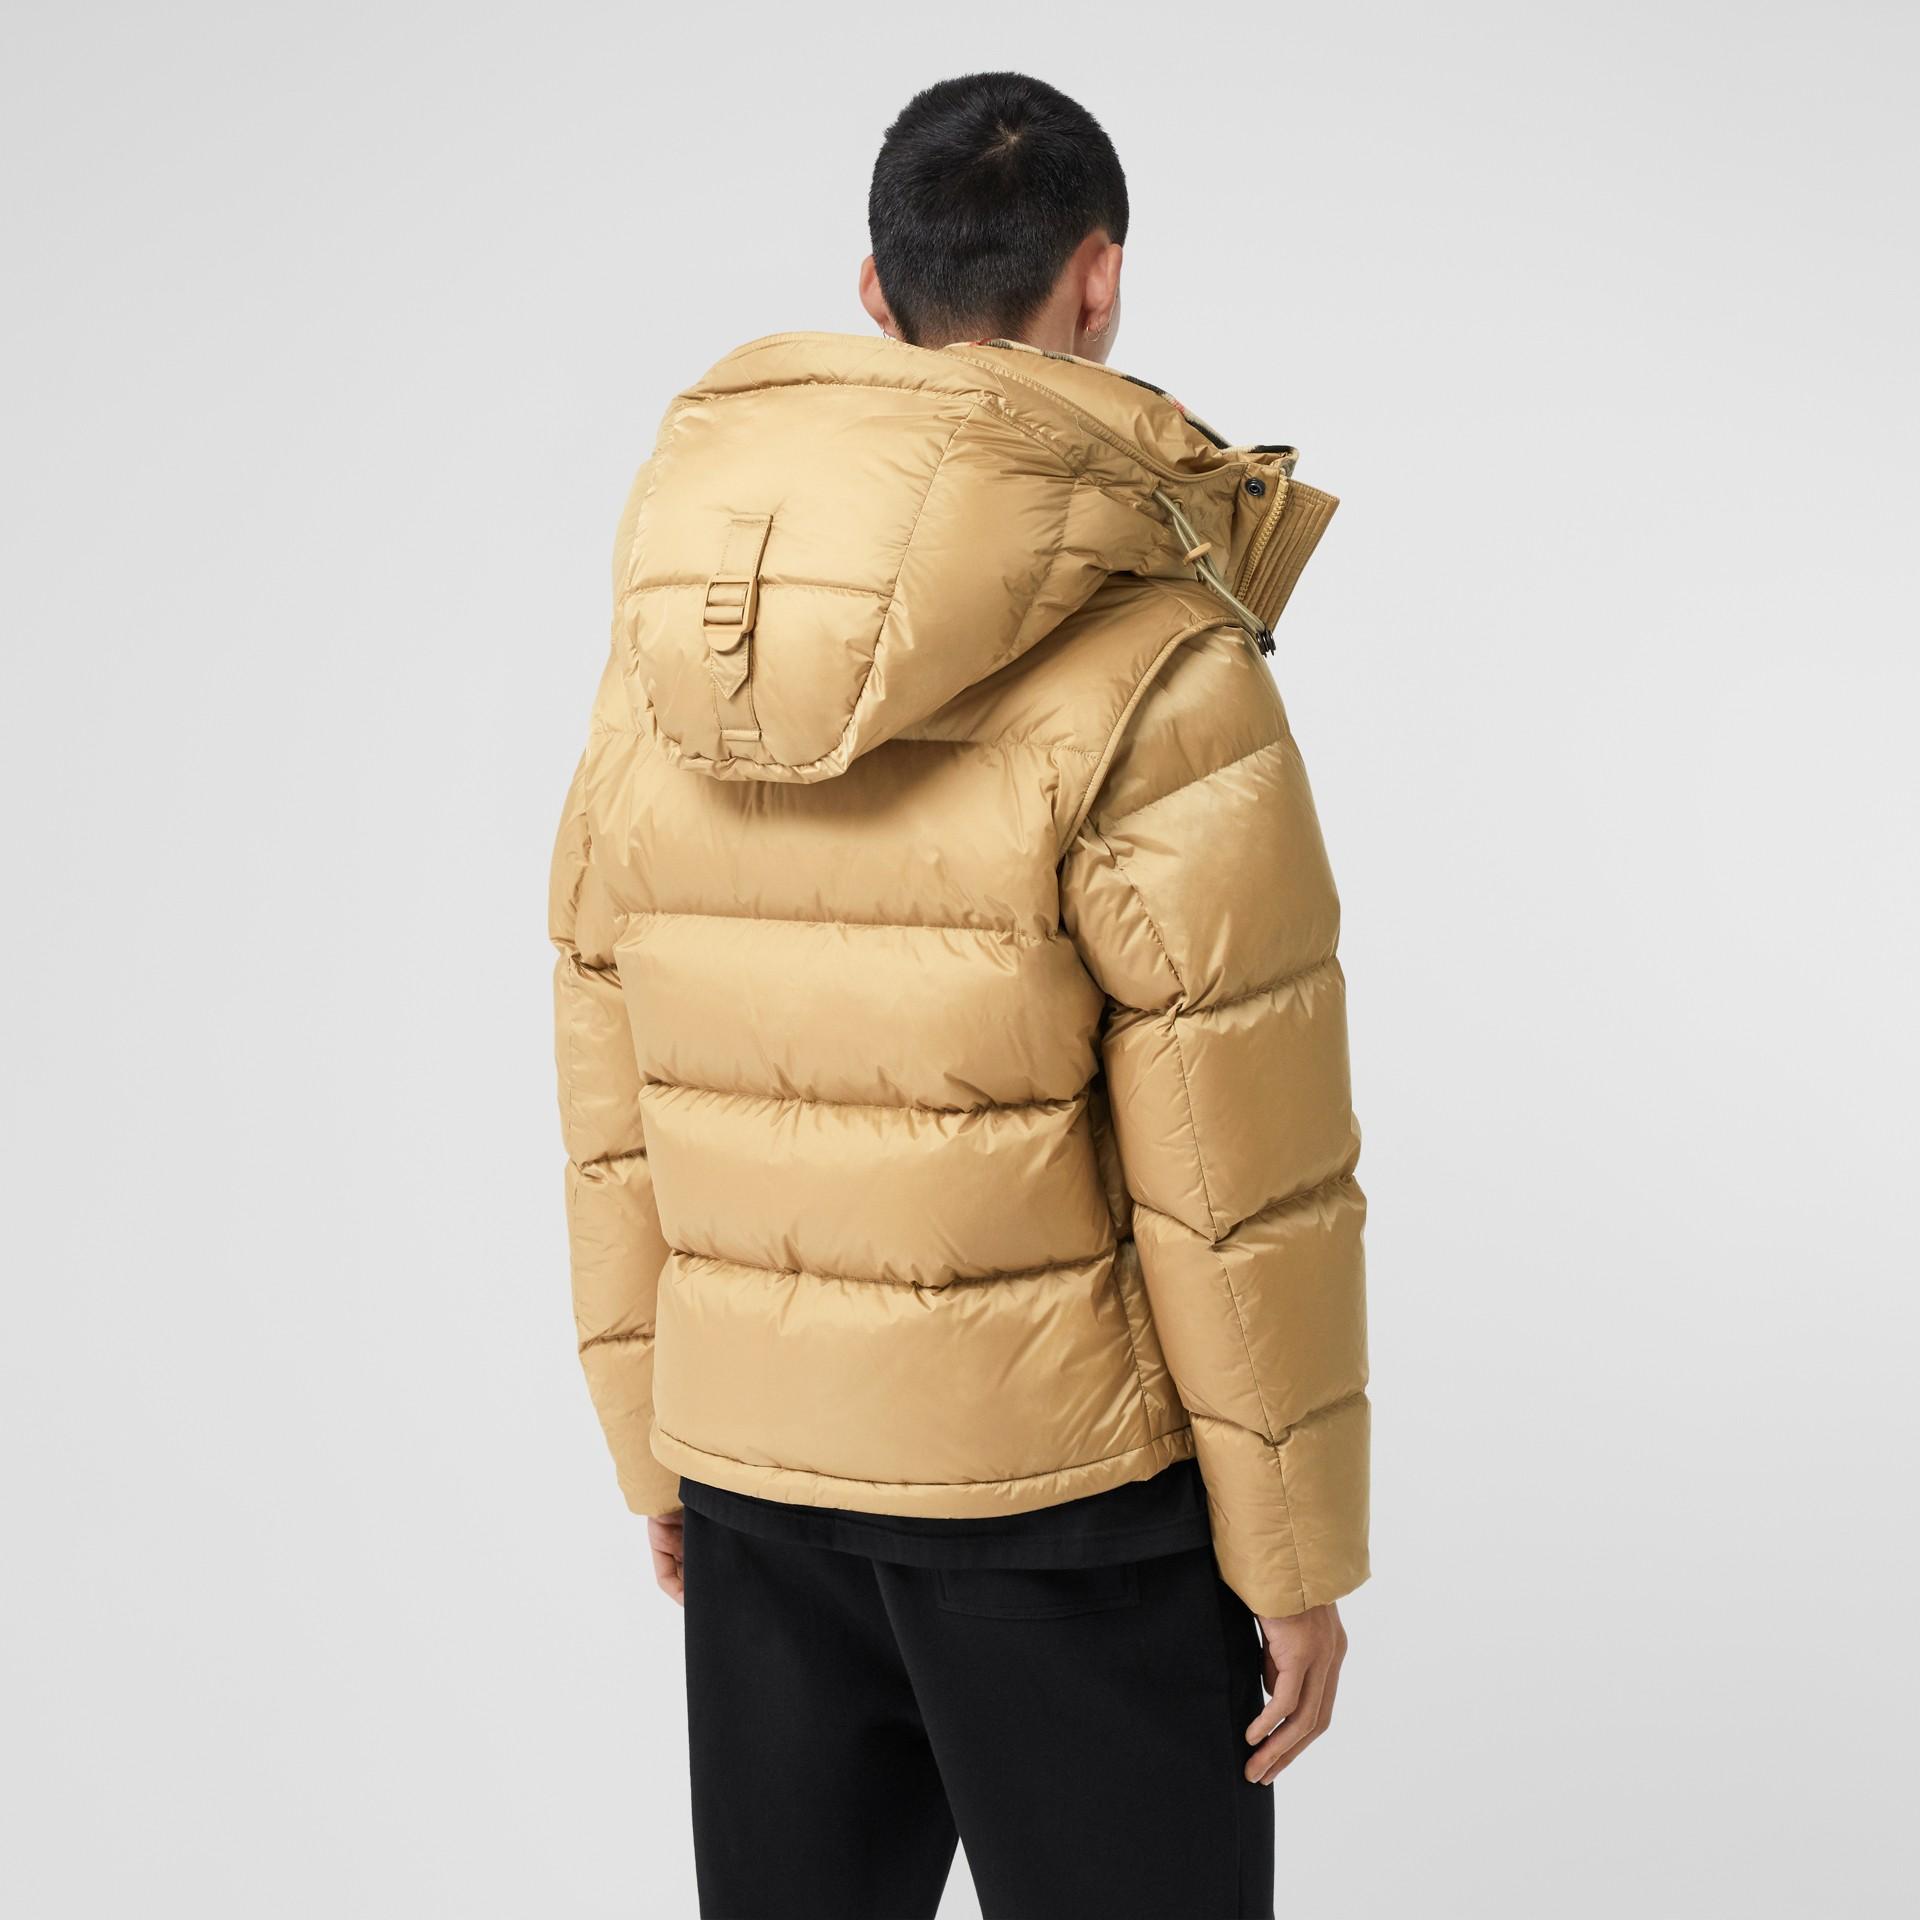 Detachable Sleeve Hooded Puffer Jacket in Honey - Men | Burberry - gallery image 2